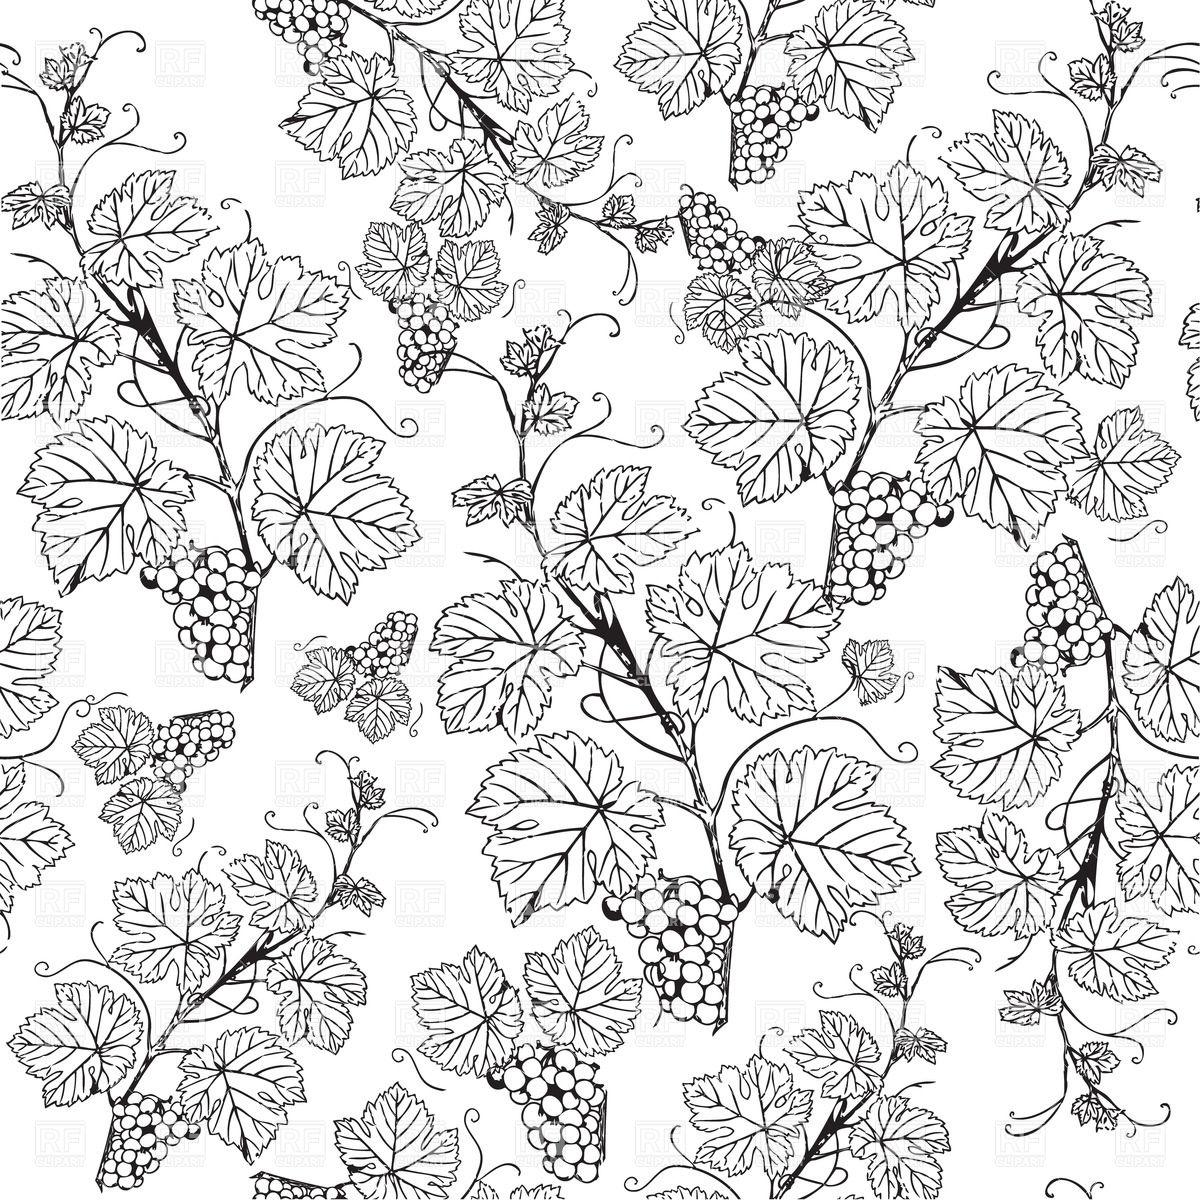 Ivy clipart grape leaves Vine Grape Patterns sketch Grape